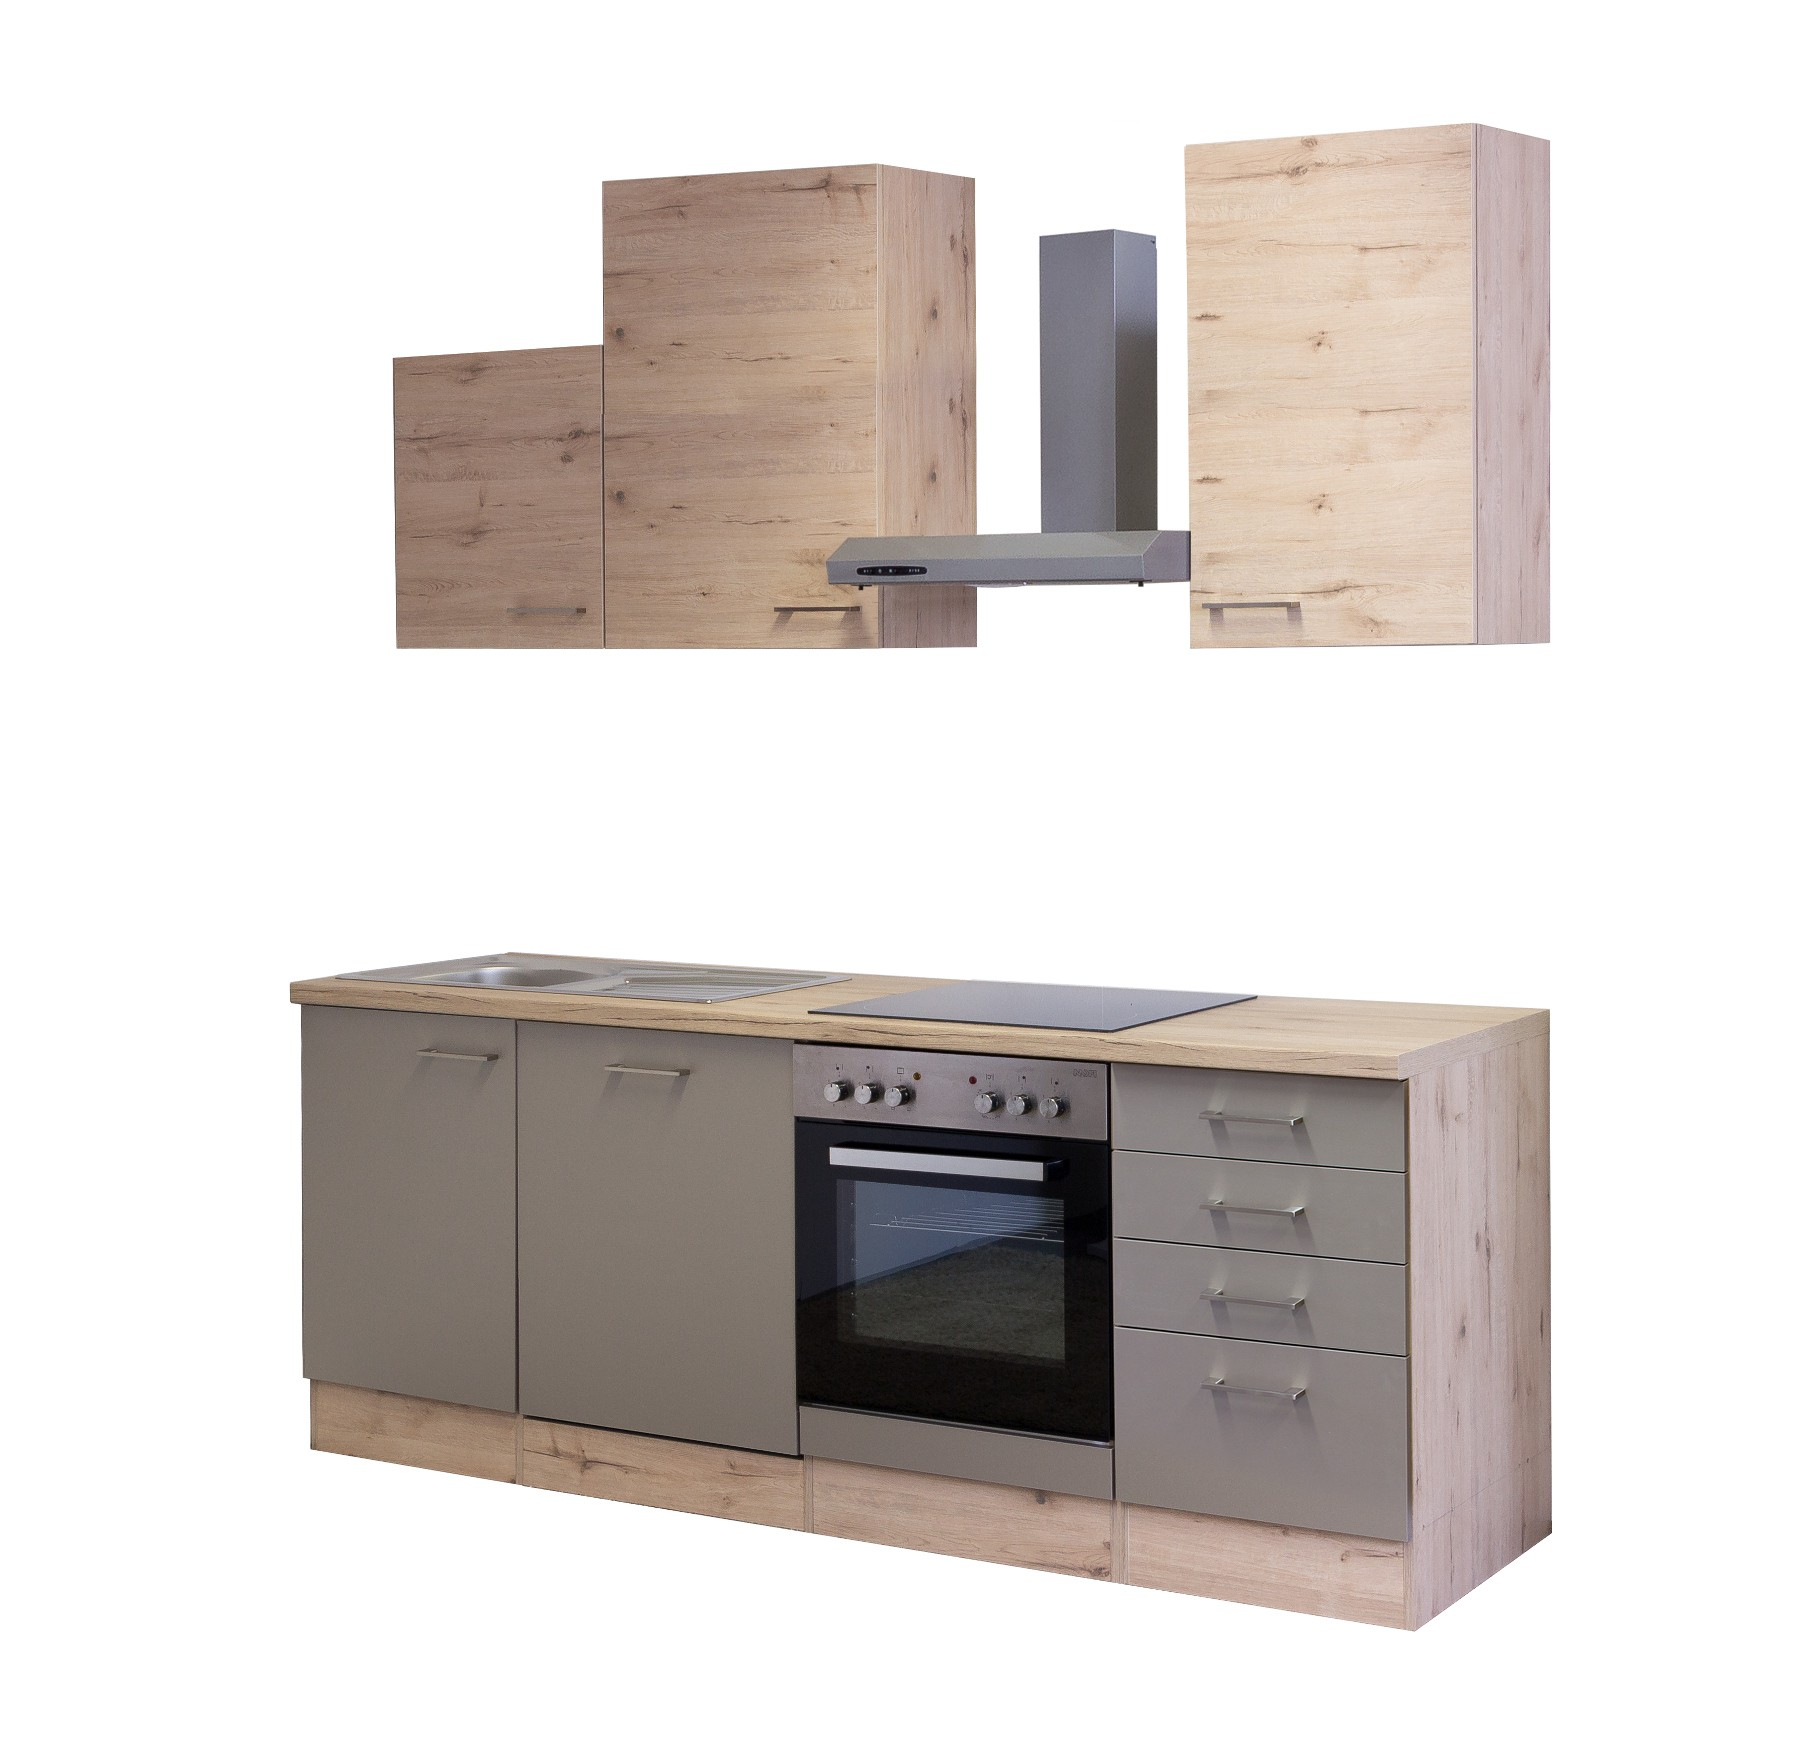 k chenzeile riva k chenblock mit elektroger ten 220 cm bronze metallic ebay. Black Bedroom Furniture Sets. Home Design Ideas